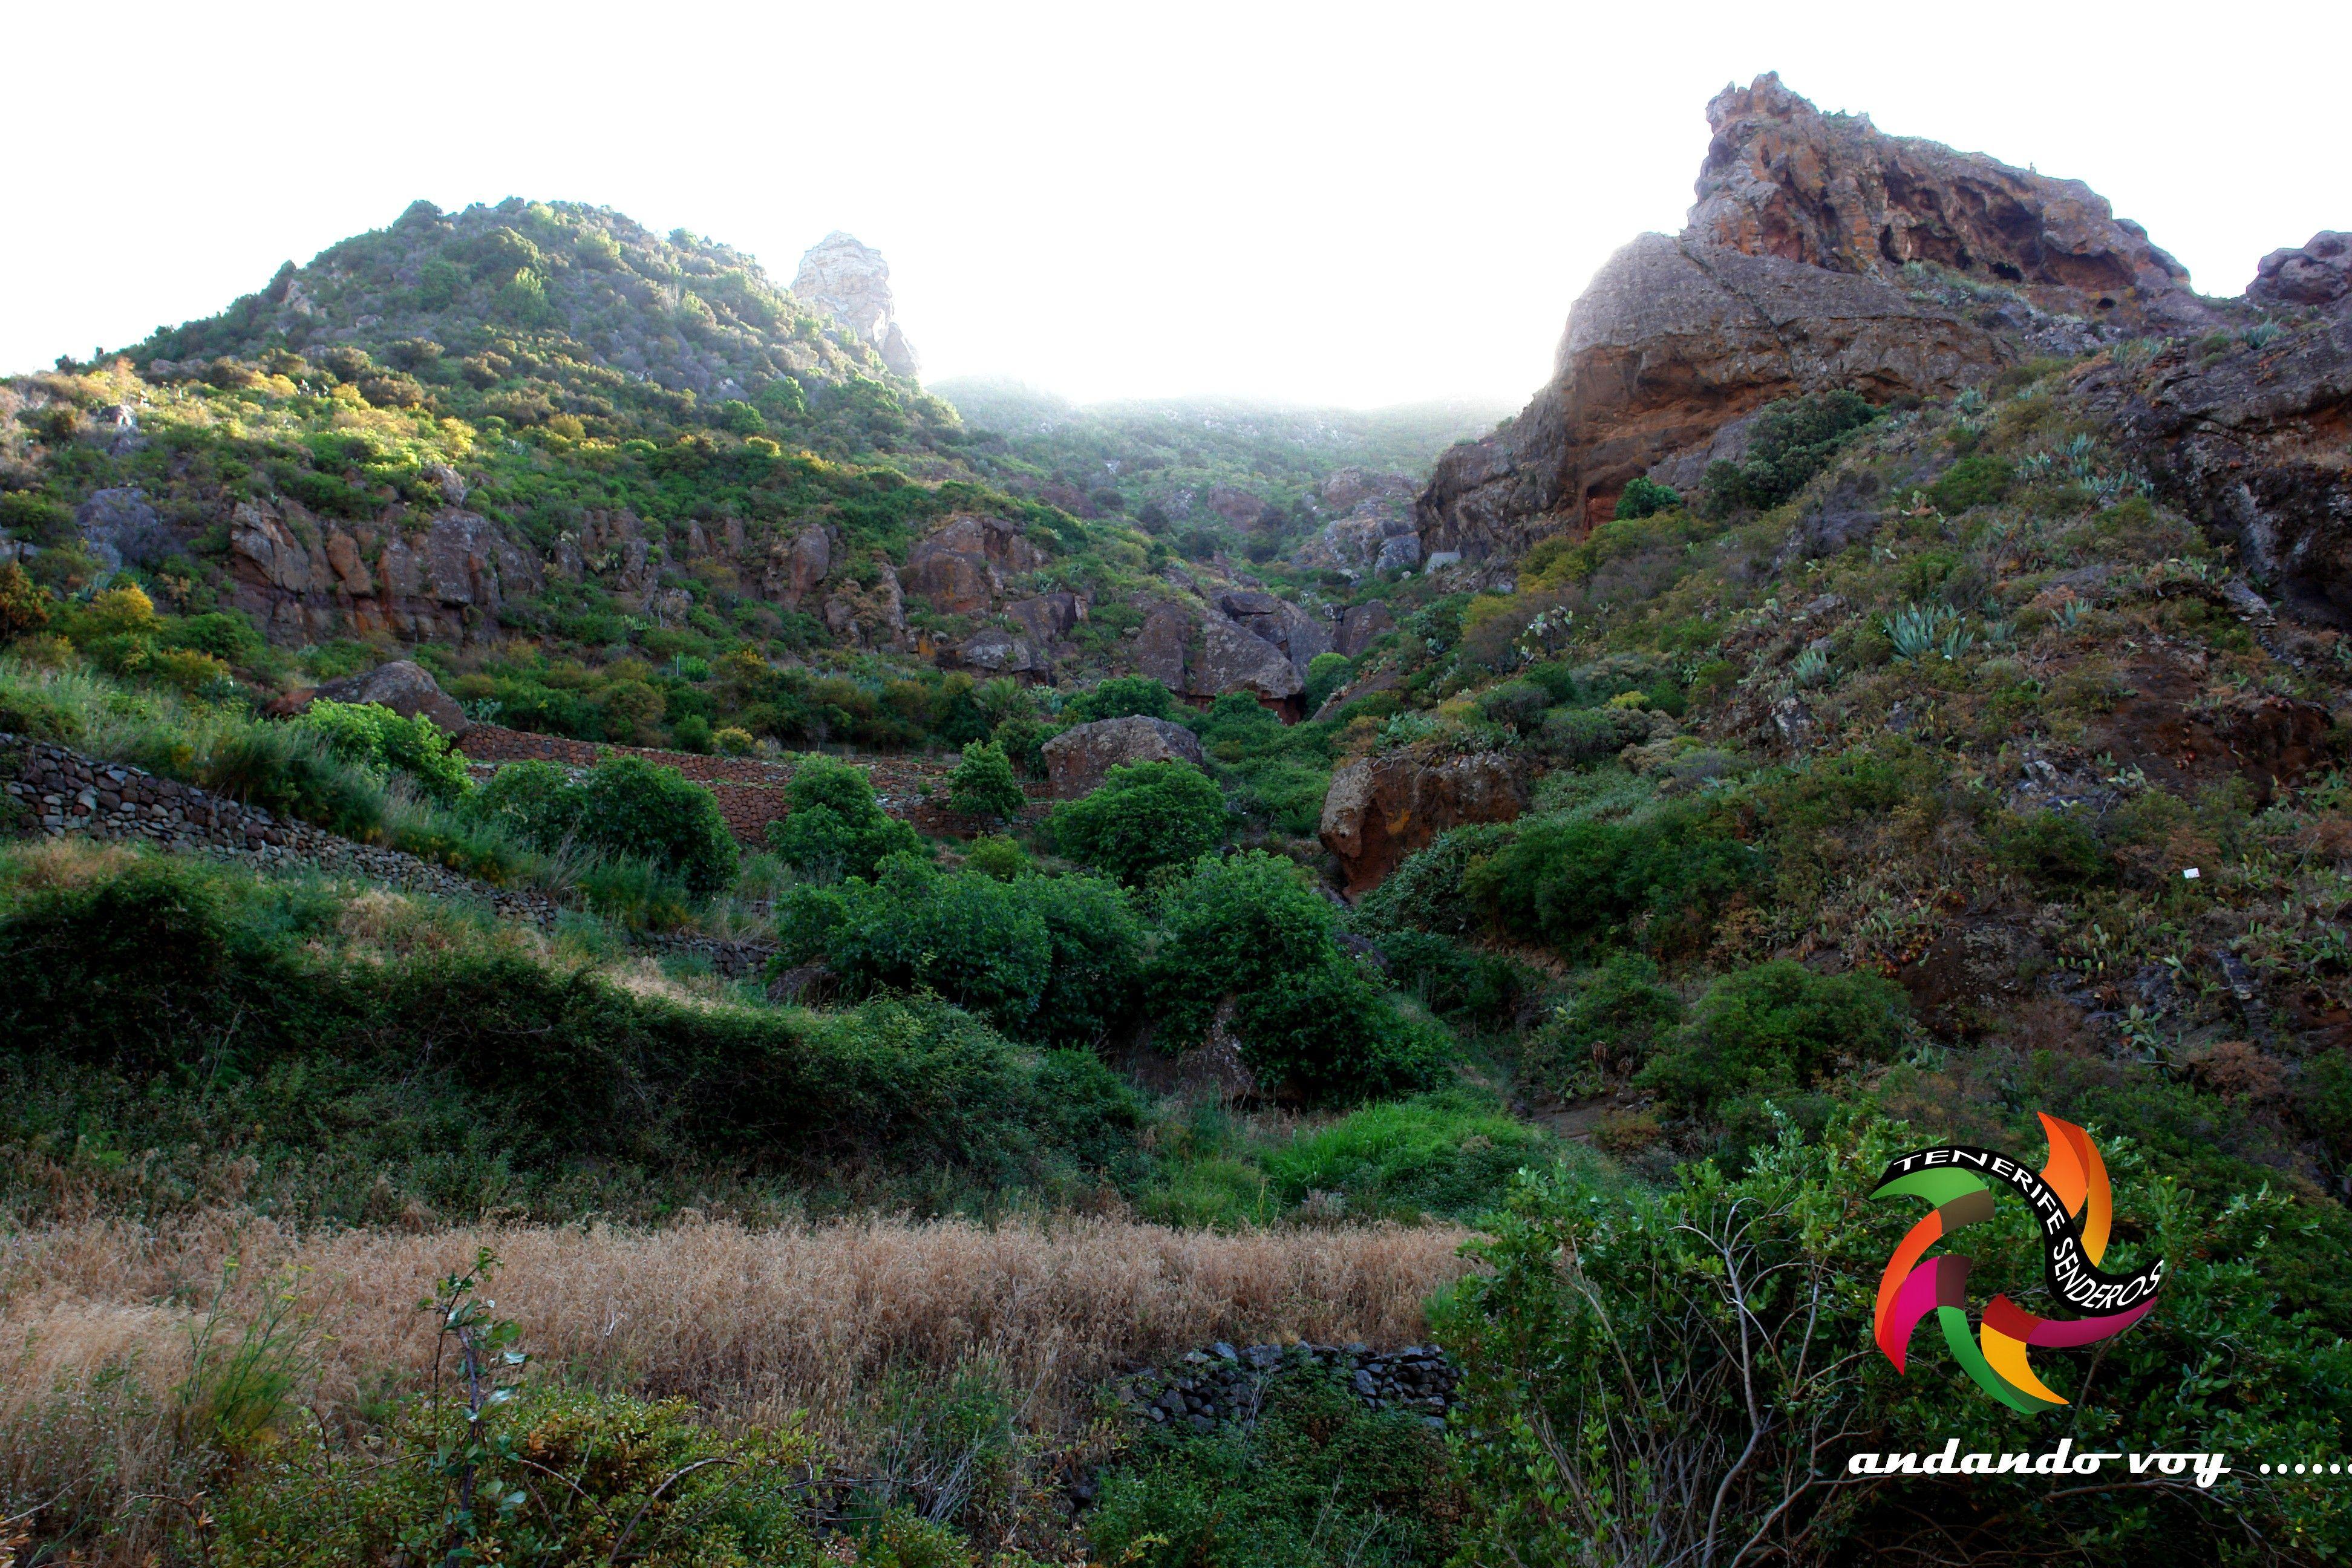 Barranco Tahodio #tenerife #landscape #hikingtenerife #canarias #tenerifesenderos #senderismo #trekking #hiking #hike #sky #nature #outdoors